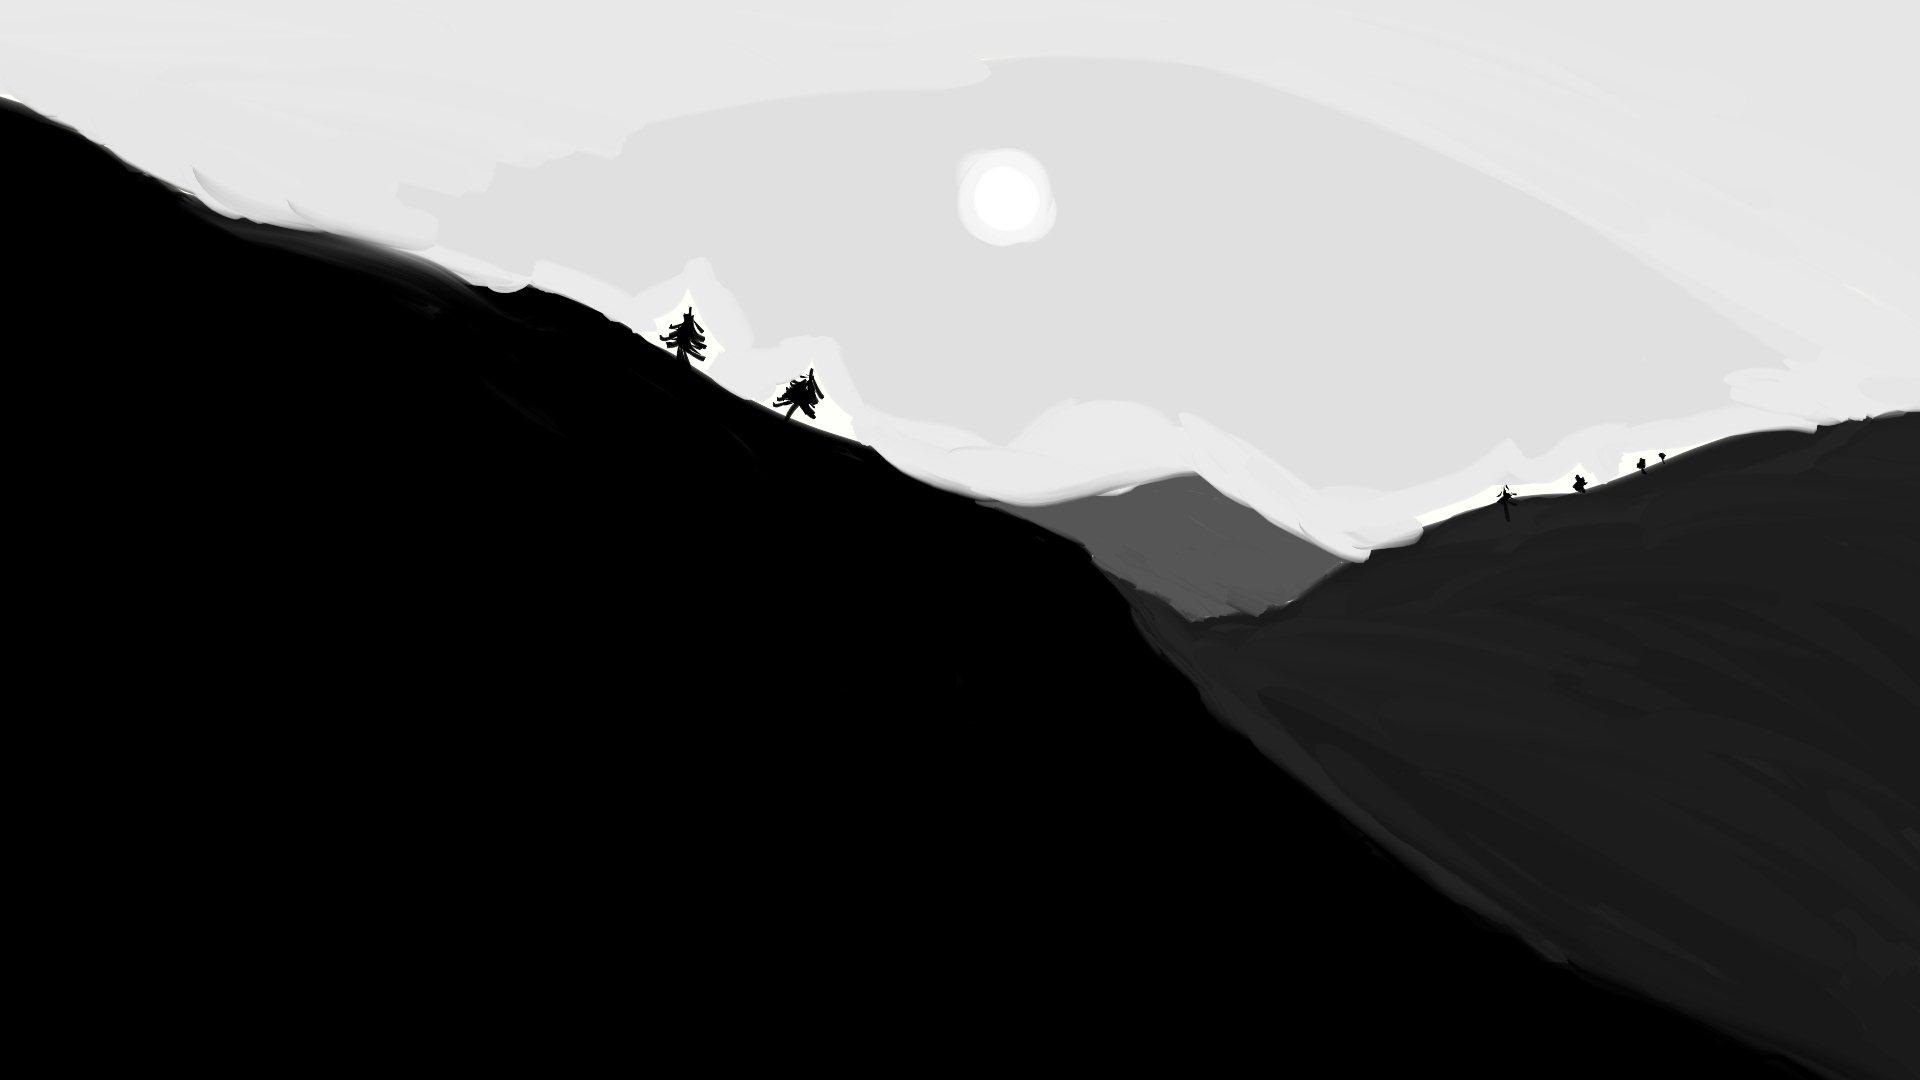 Free download Minimal Black Hills Cool Wallpapers ...